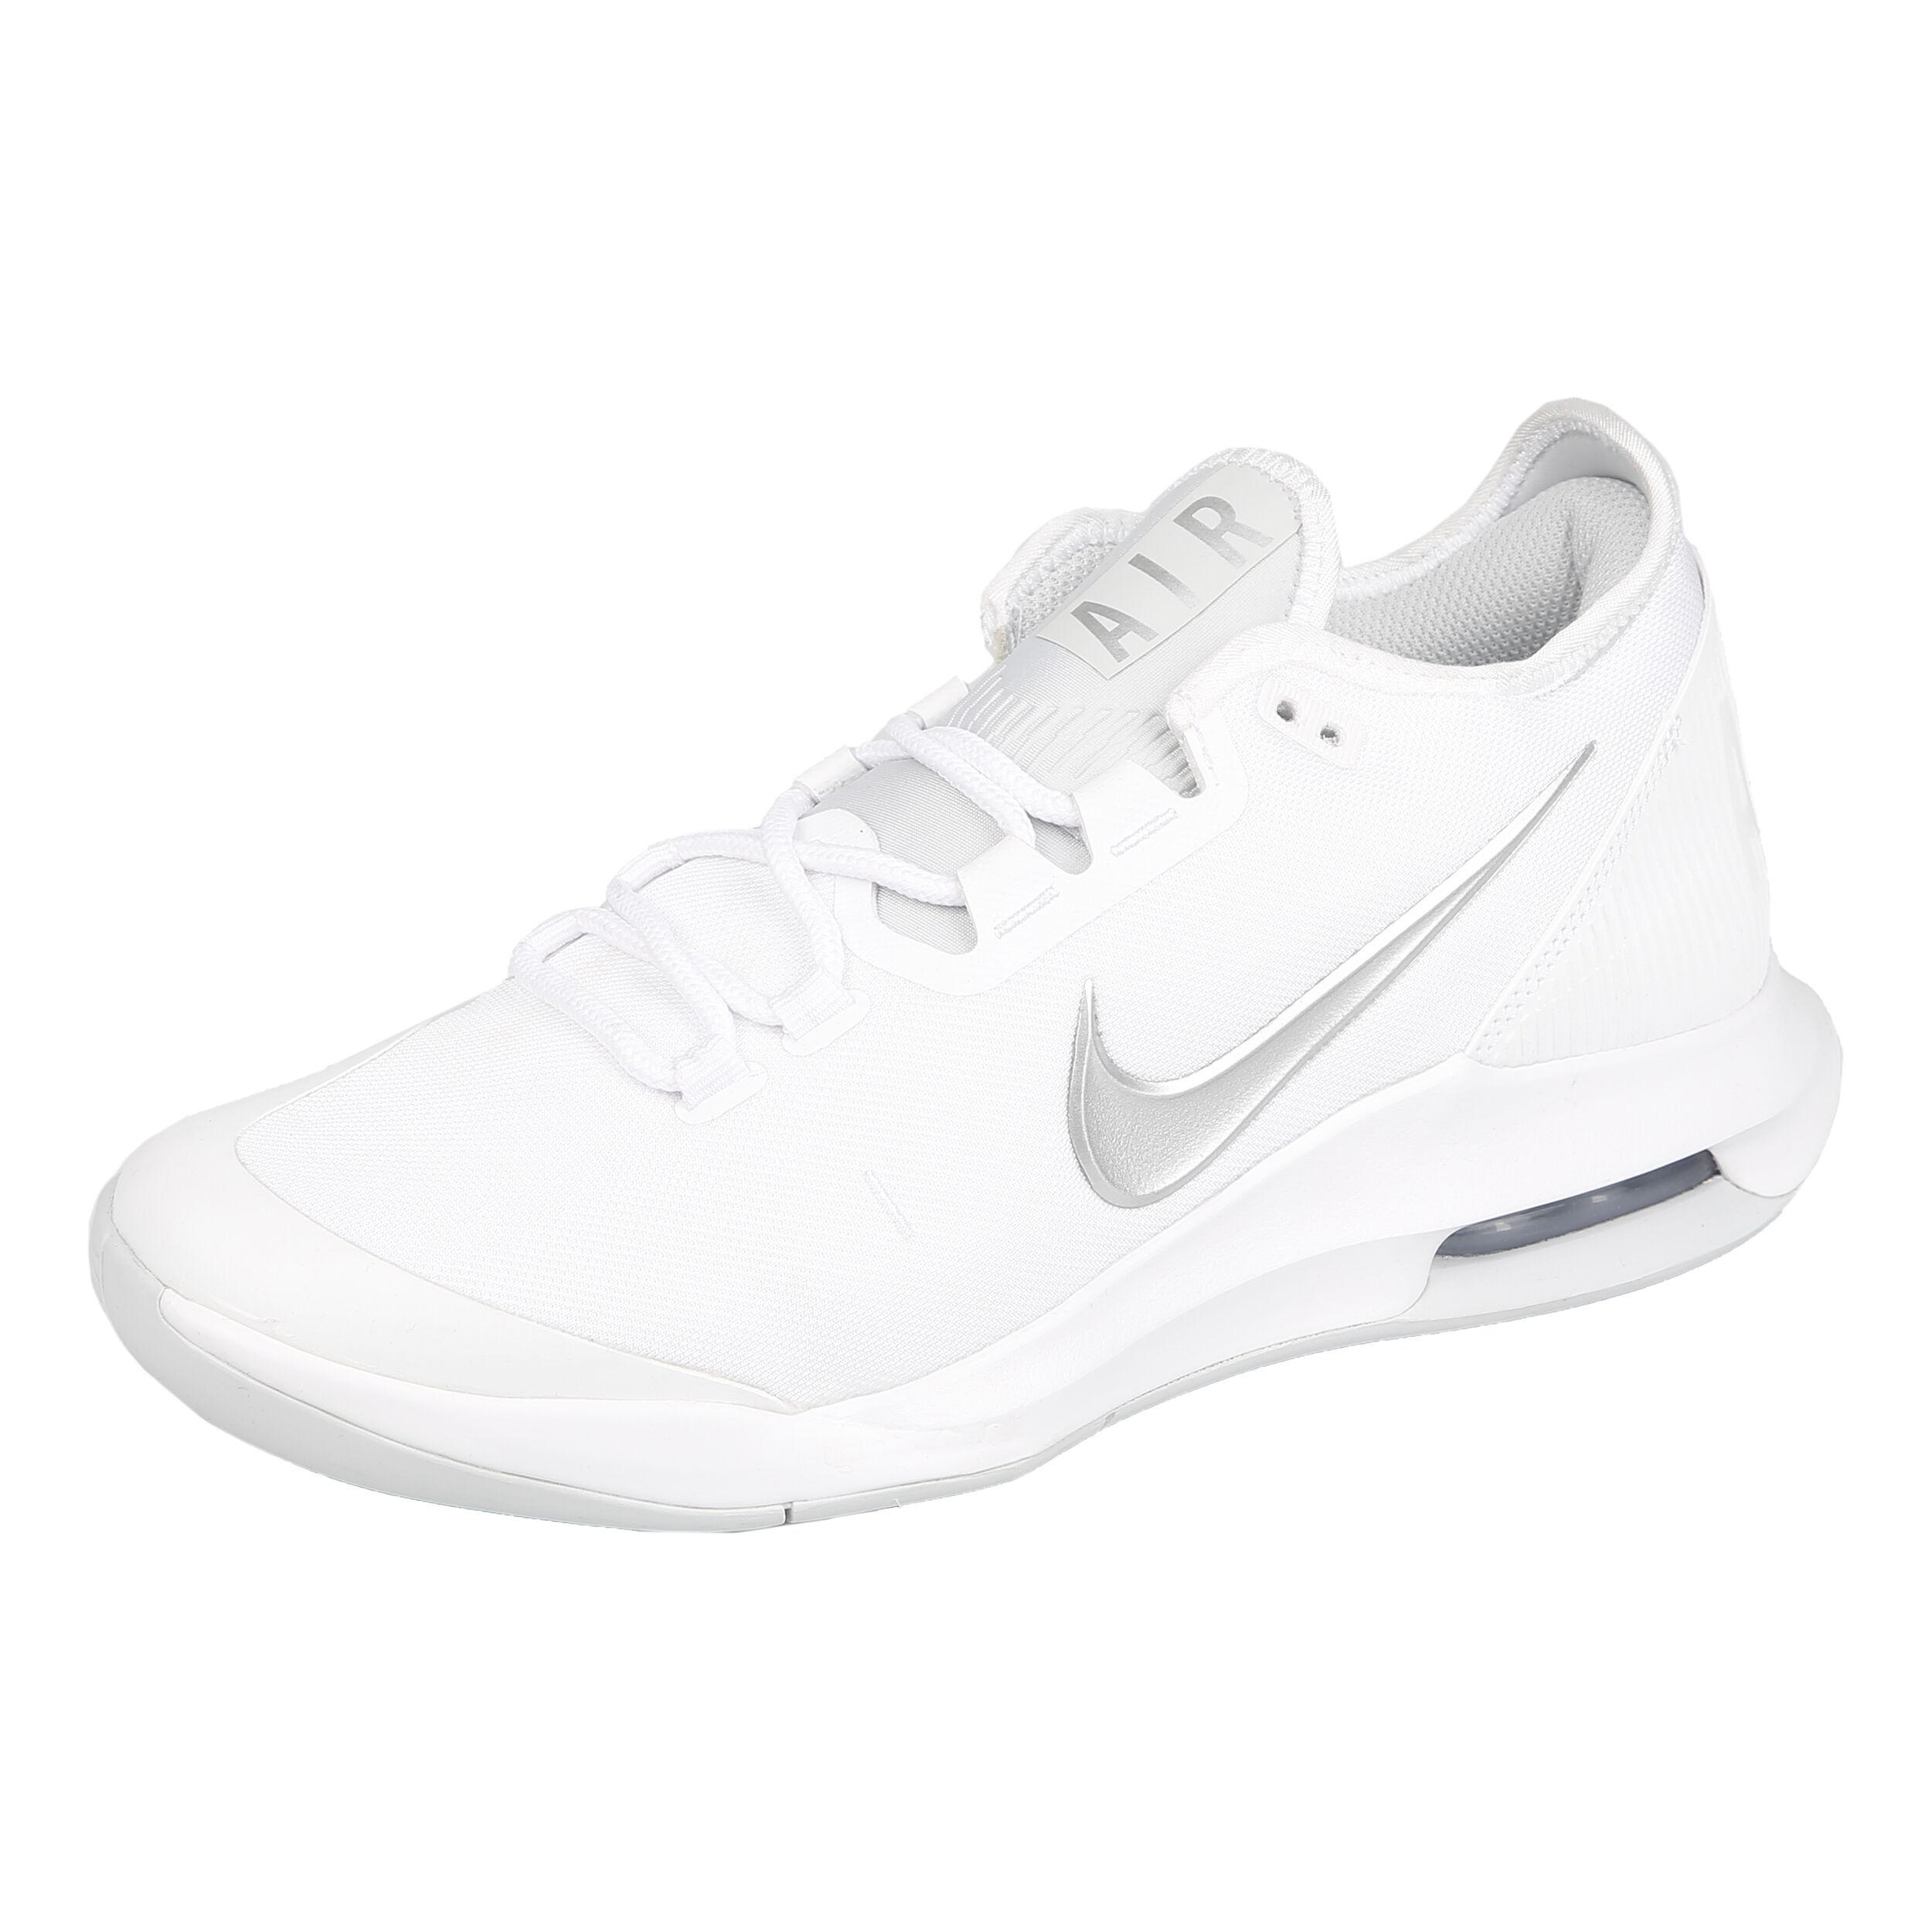 Nike Air Max Wildcard Allroundsko Damer Vit, Silver köp